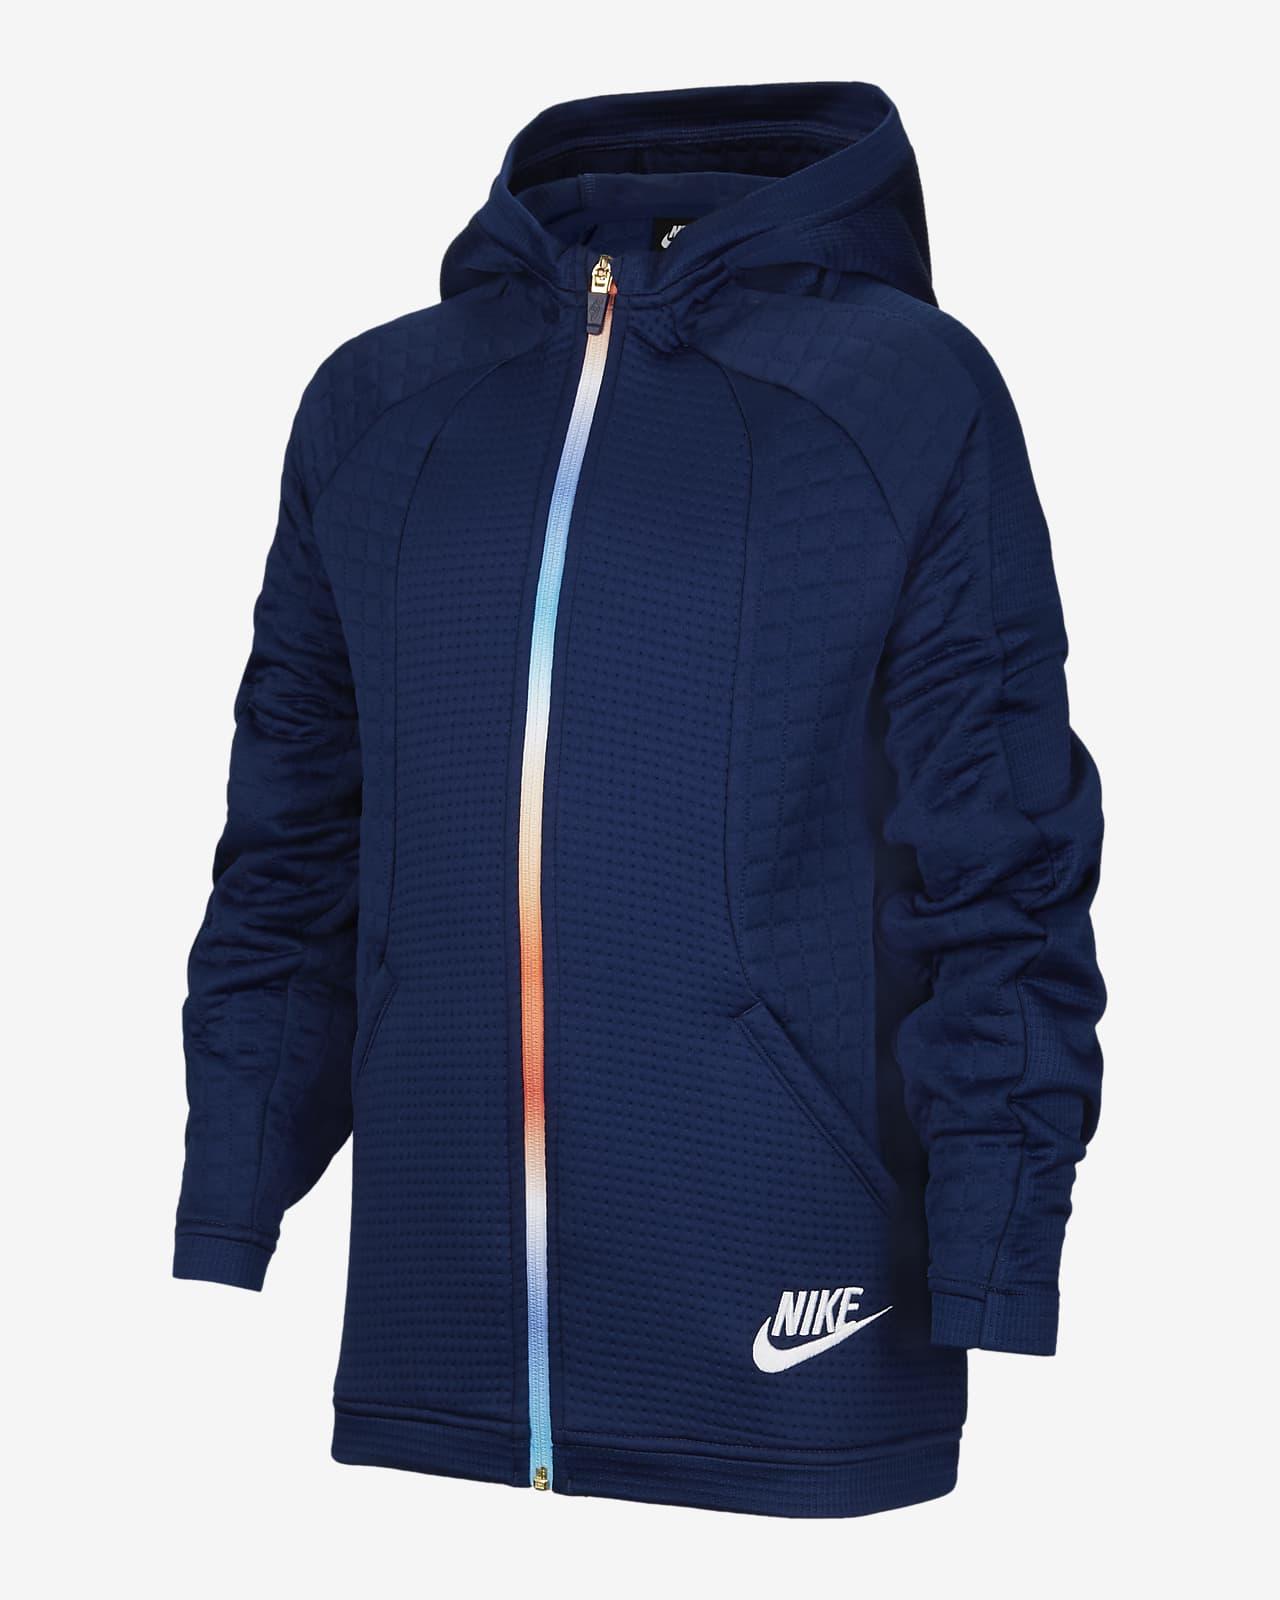 Nike Sportswear 大童(男孩)针织全长拉链开襟连帽衫